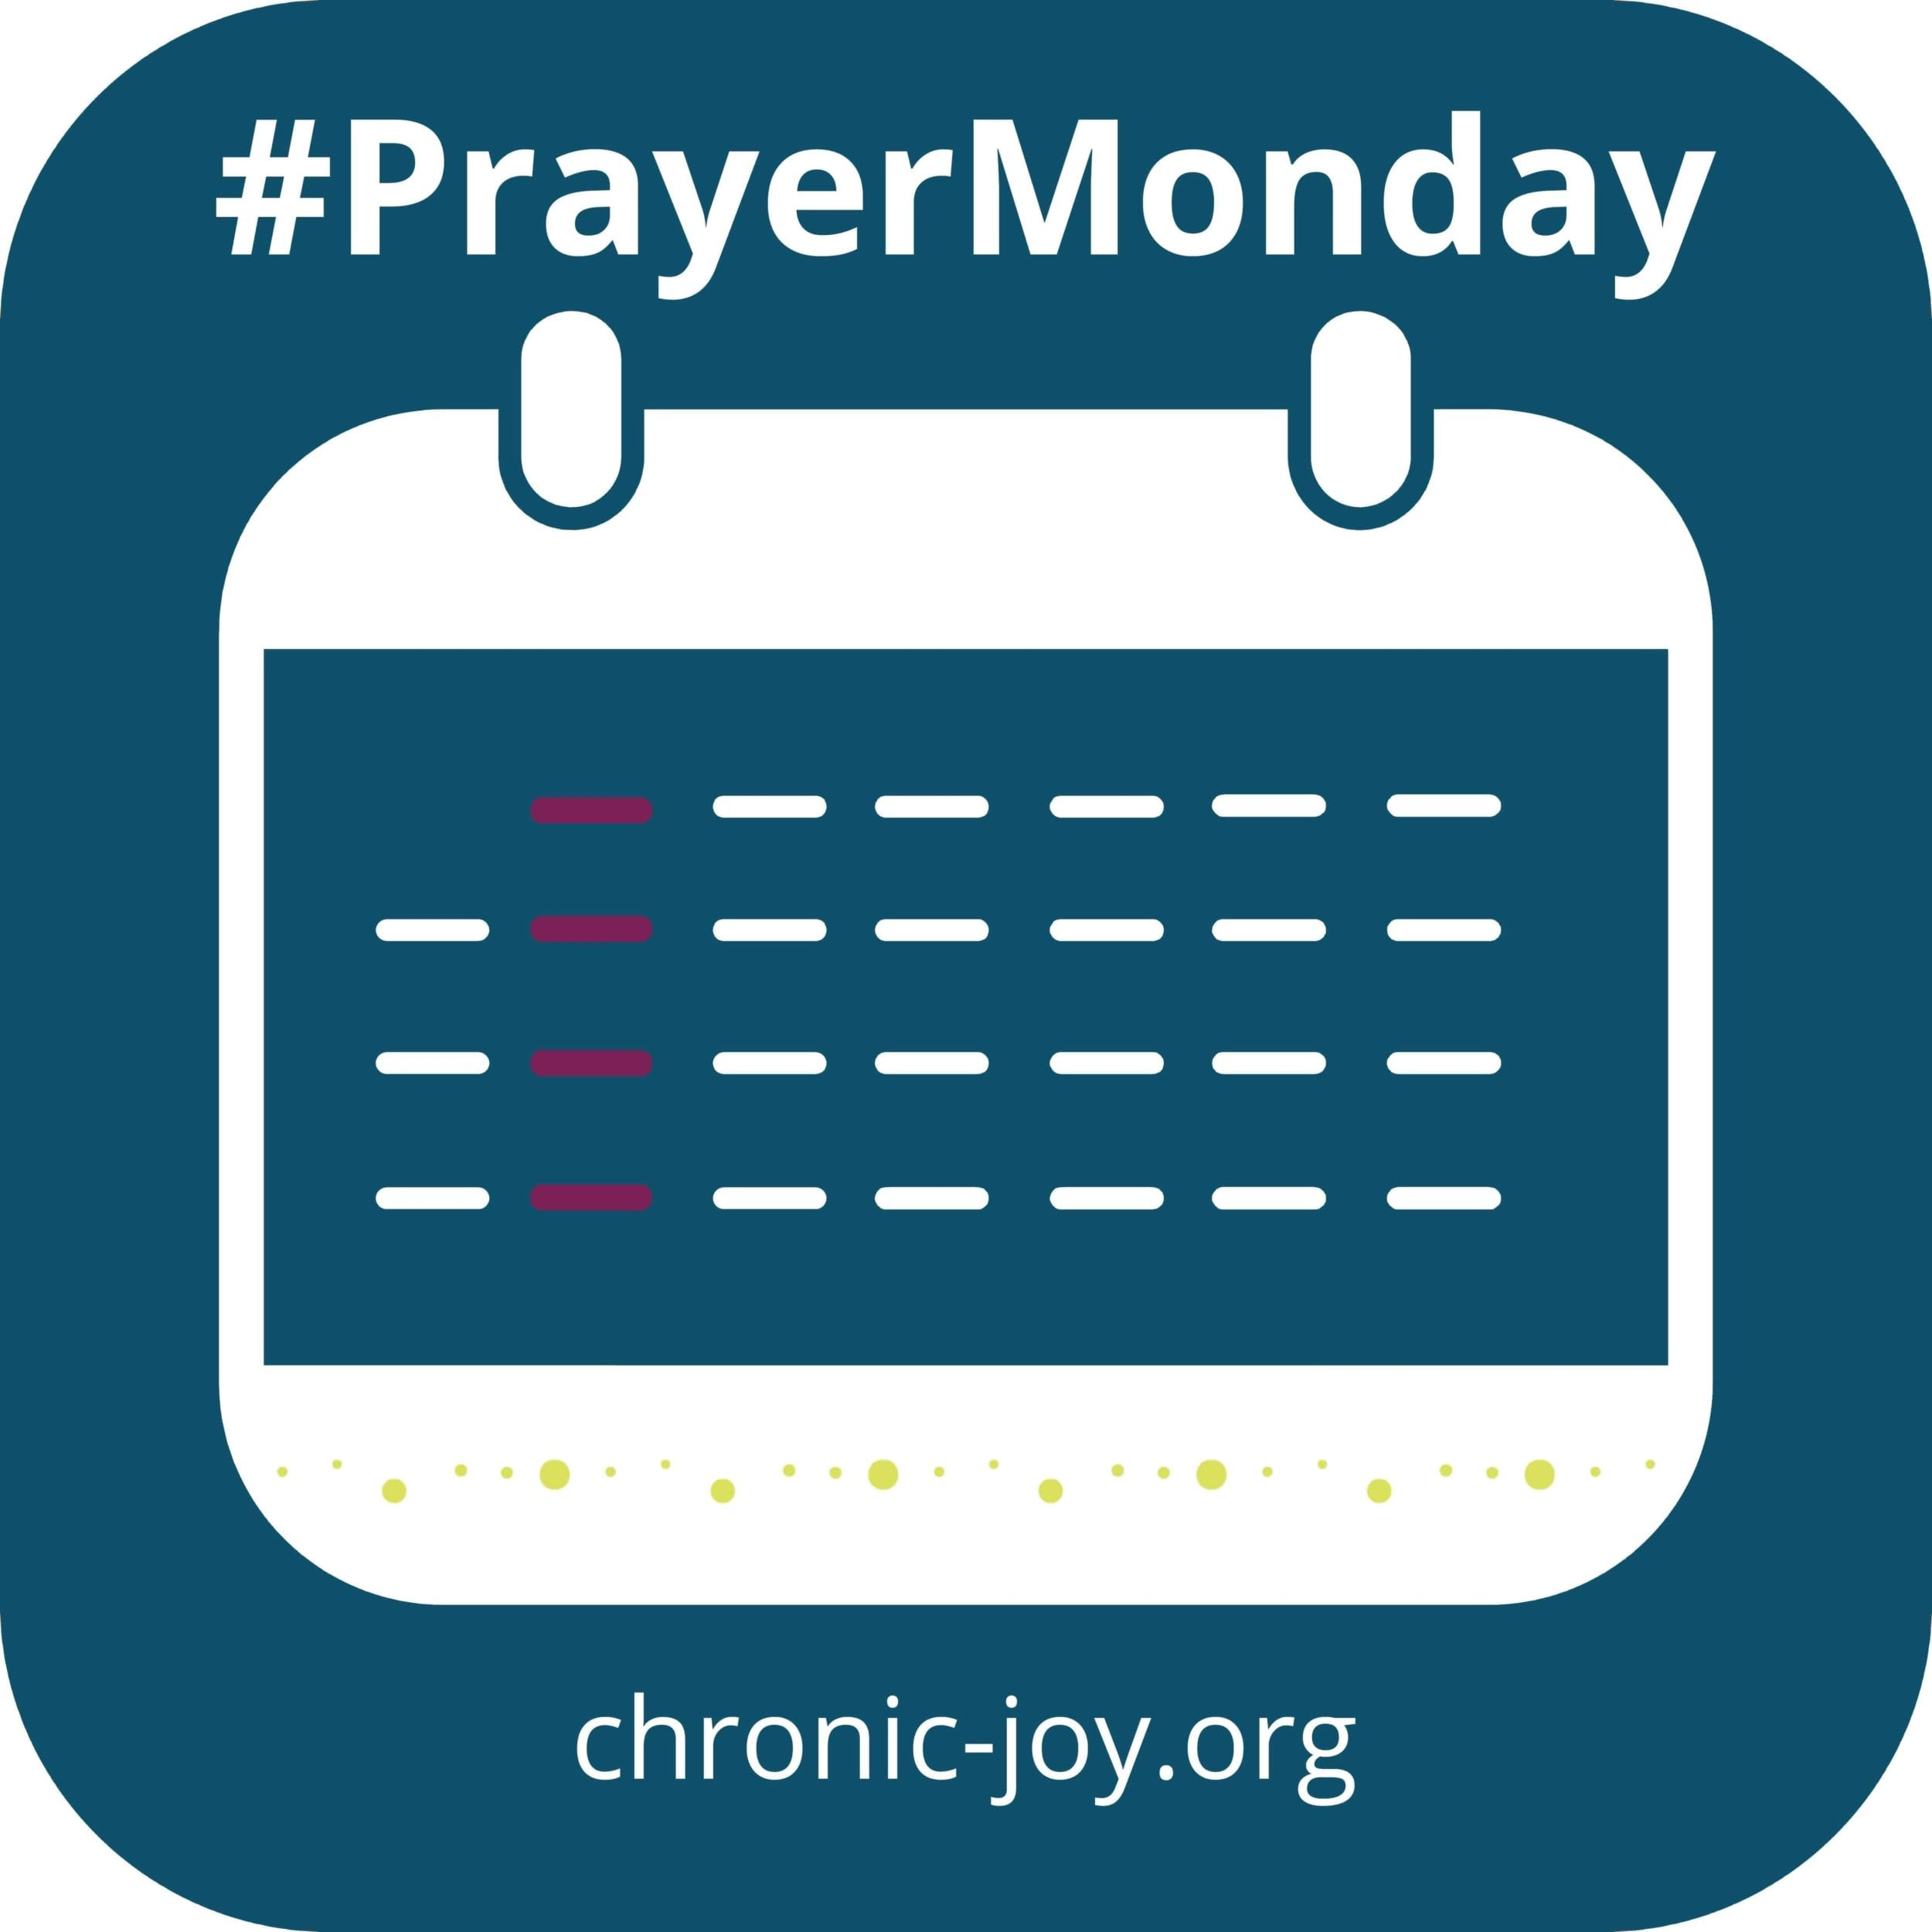 #PrayerMonday